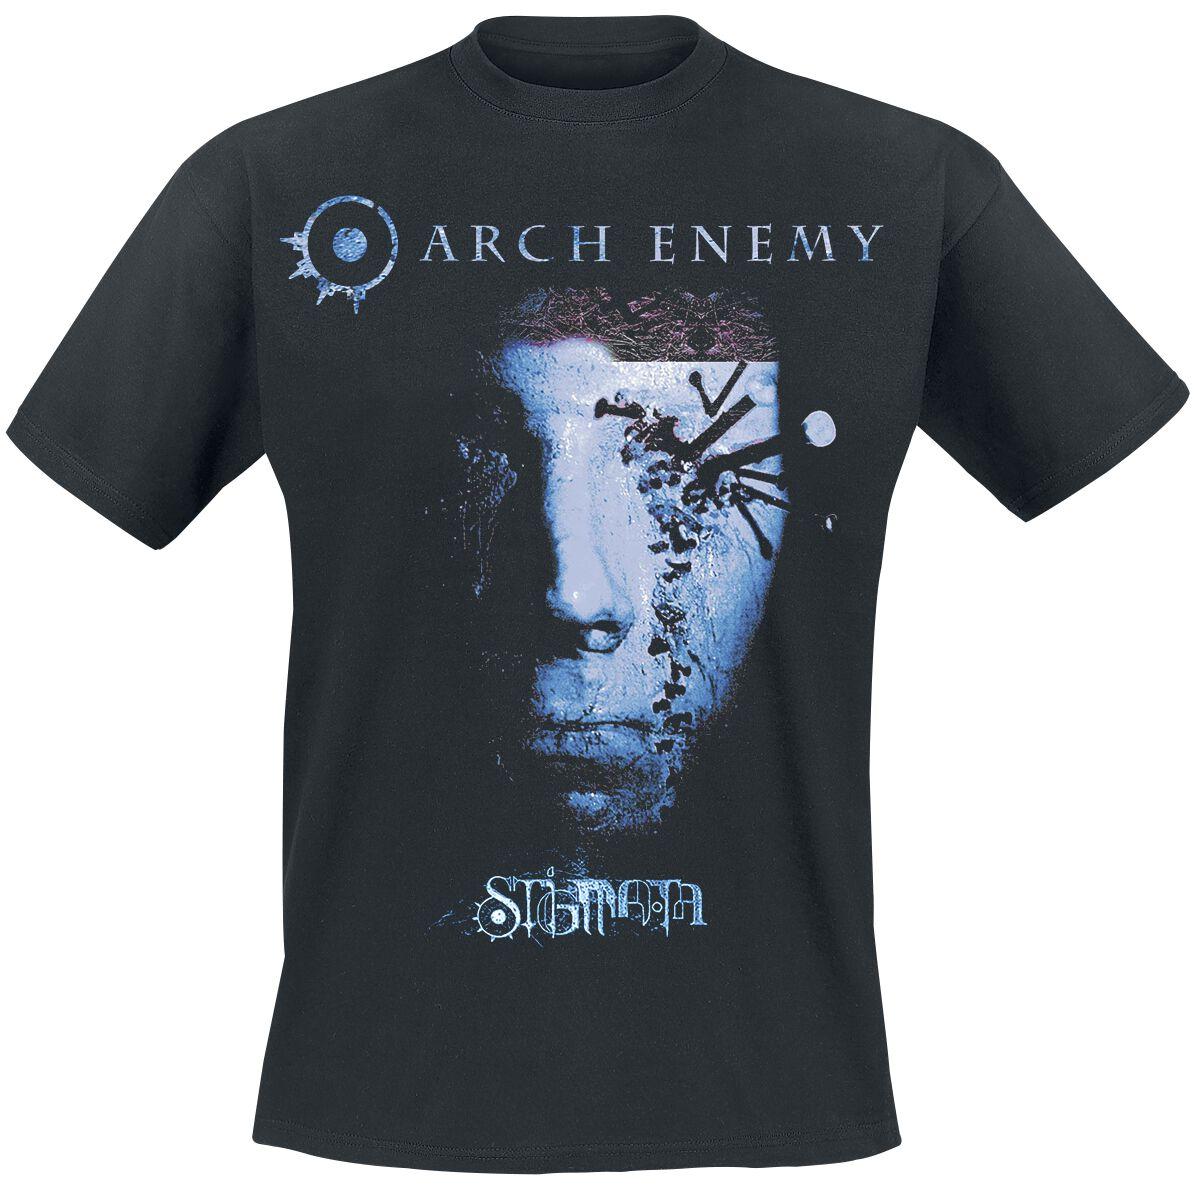 Image of   Arch Enemy Stigmata 2 T-Shirt sort